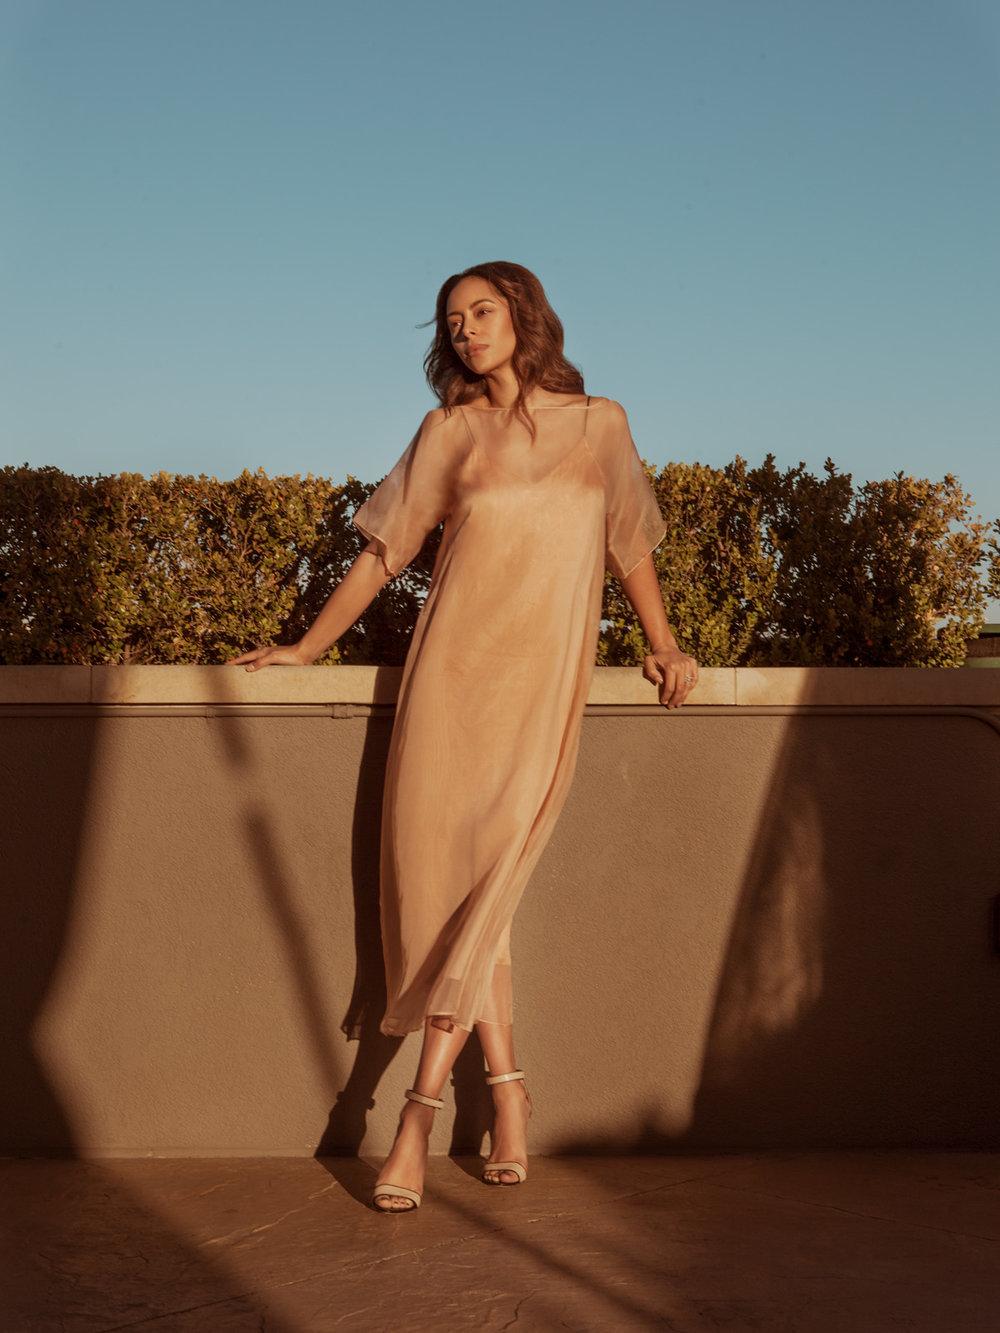 On Amber dress by  Kamperett,  shoes by  Club Monaco